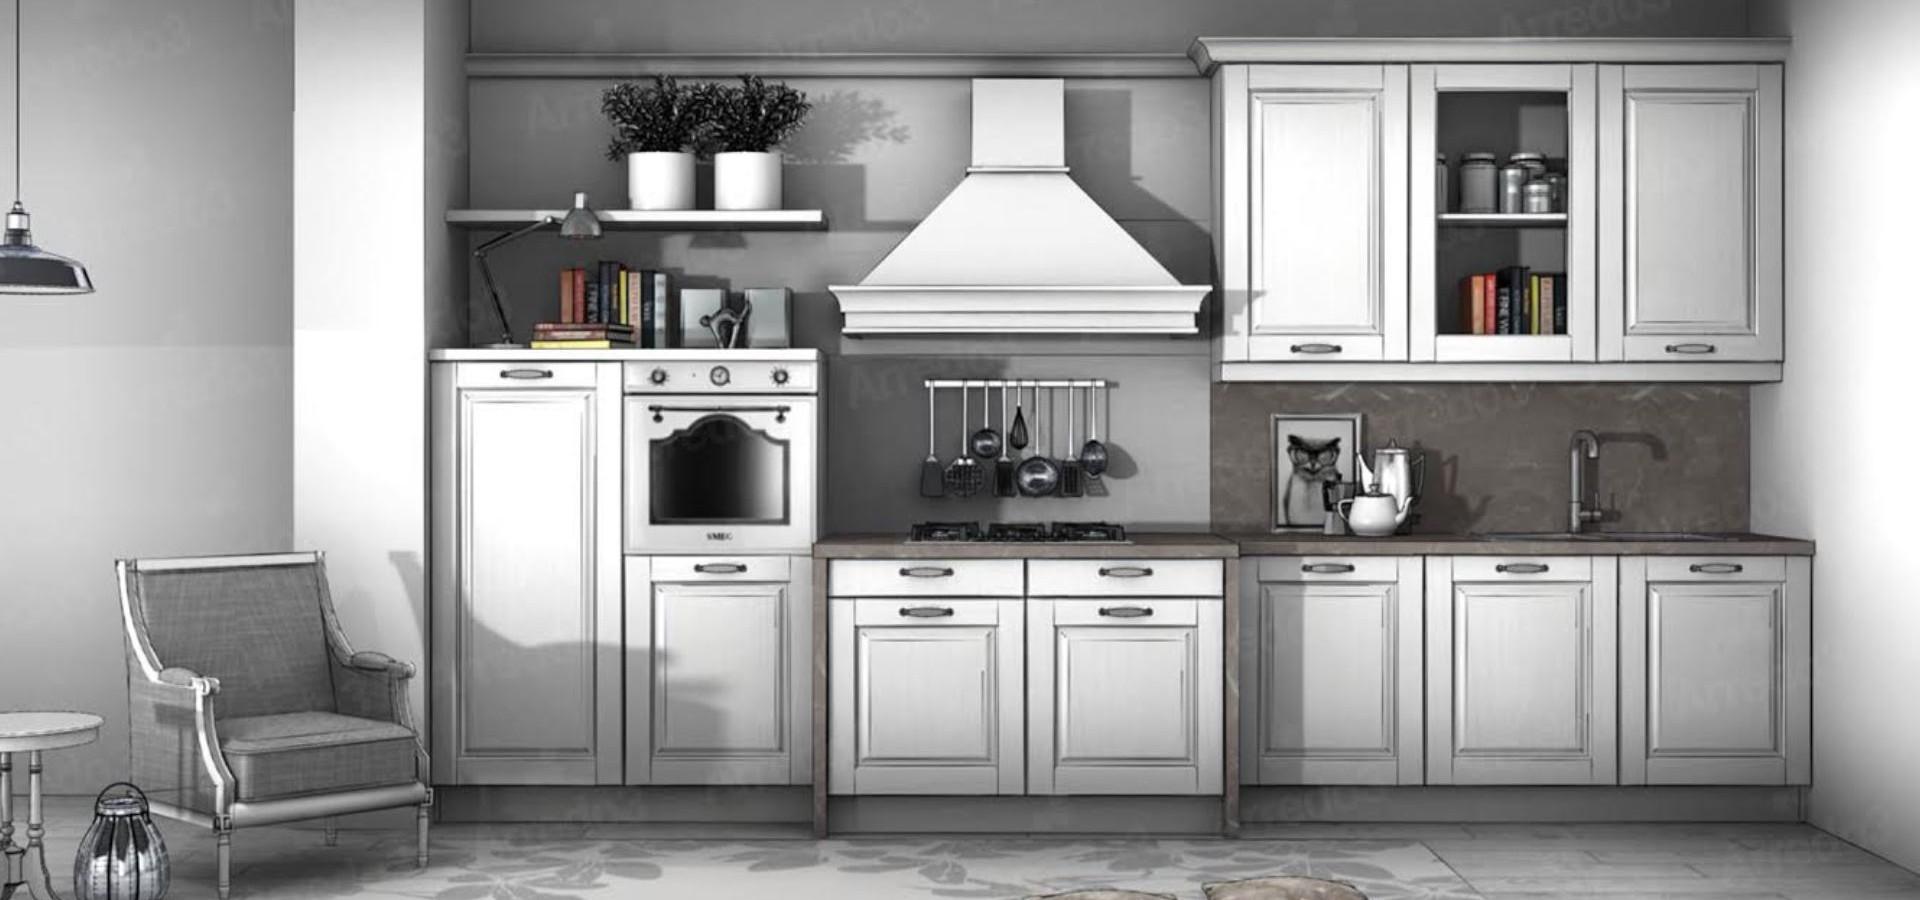 Итальянская Кухня ASOLO LC01 | Цена на Кухня ASOLO LC01 ARREDO3